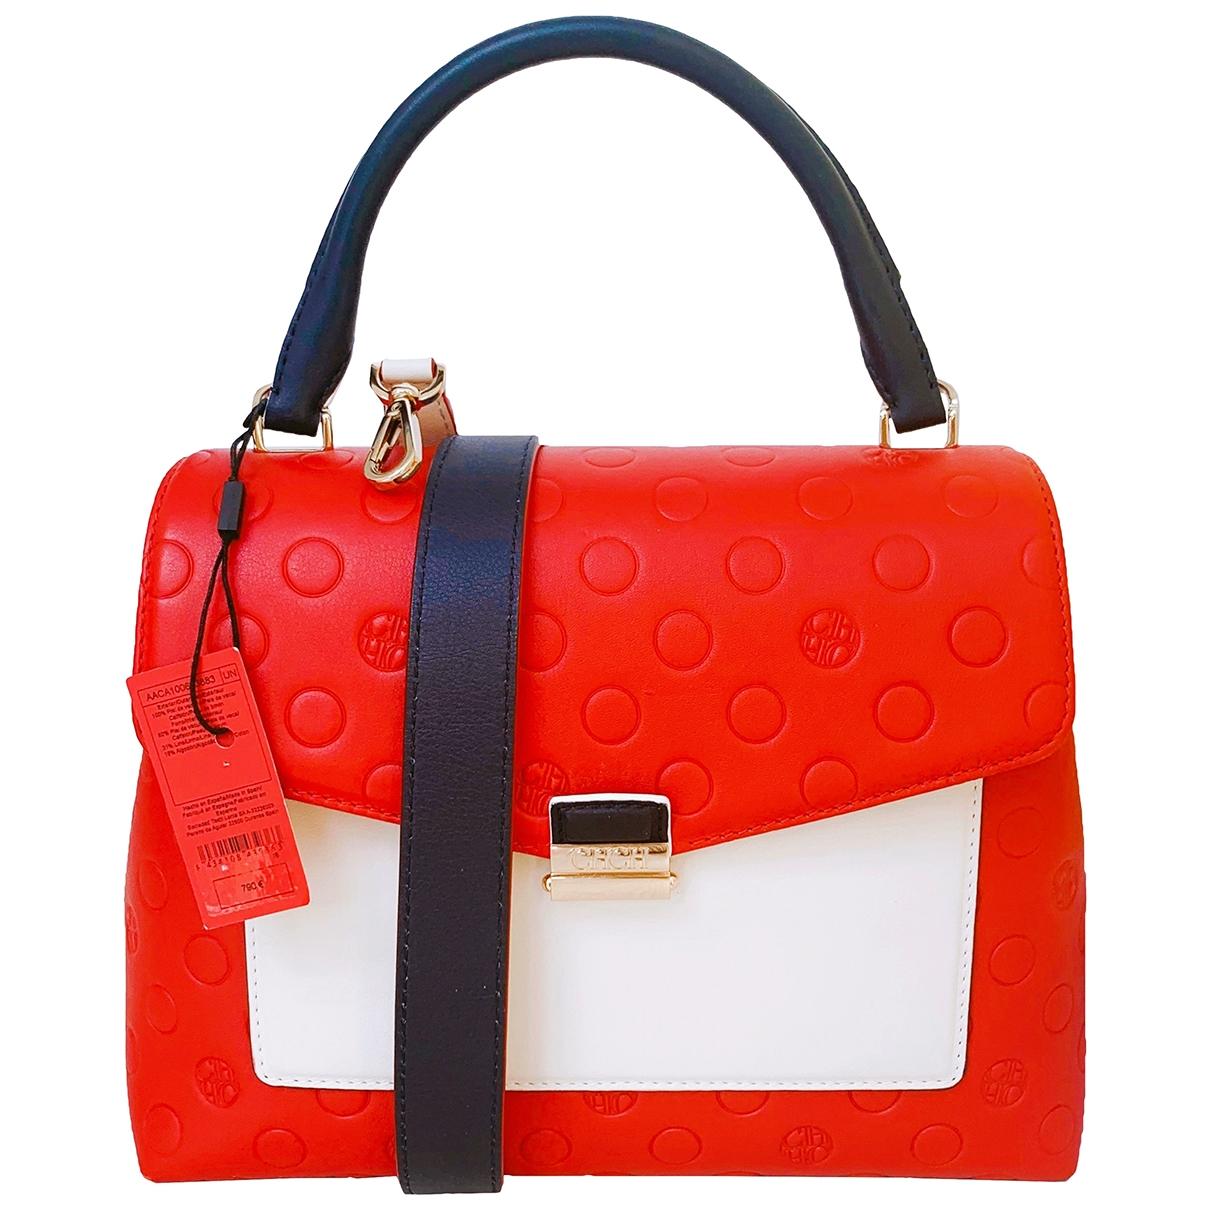 Carolina Herrera \N Handtasche in  Rot Leder